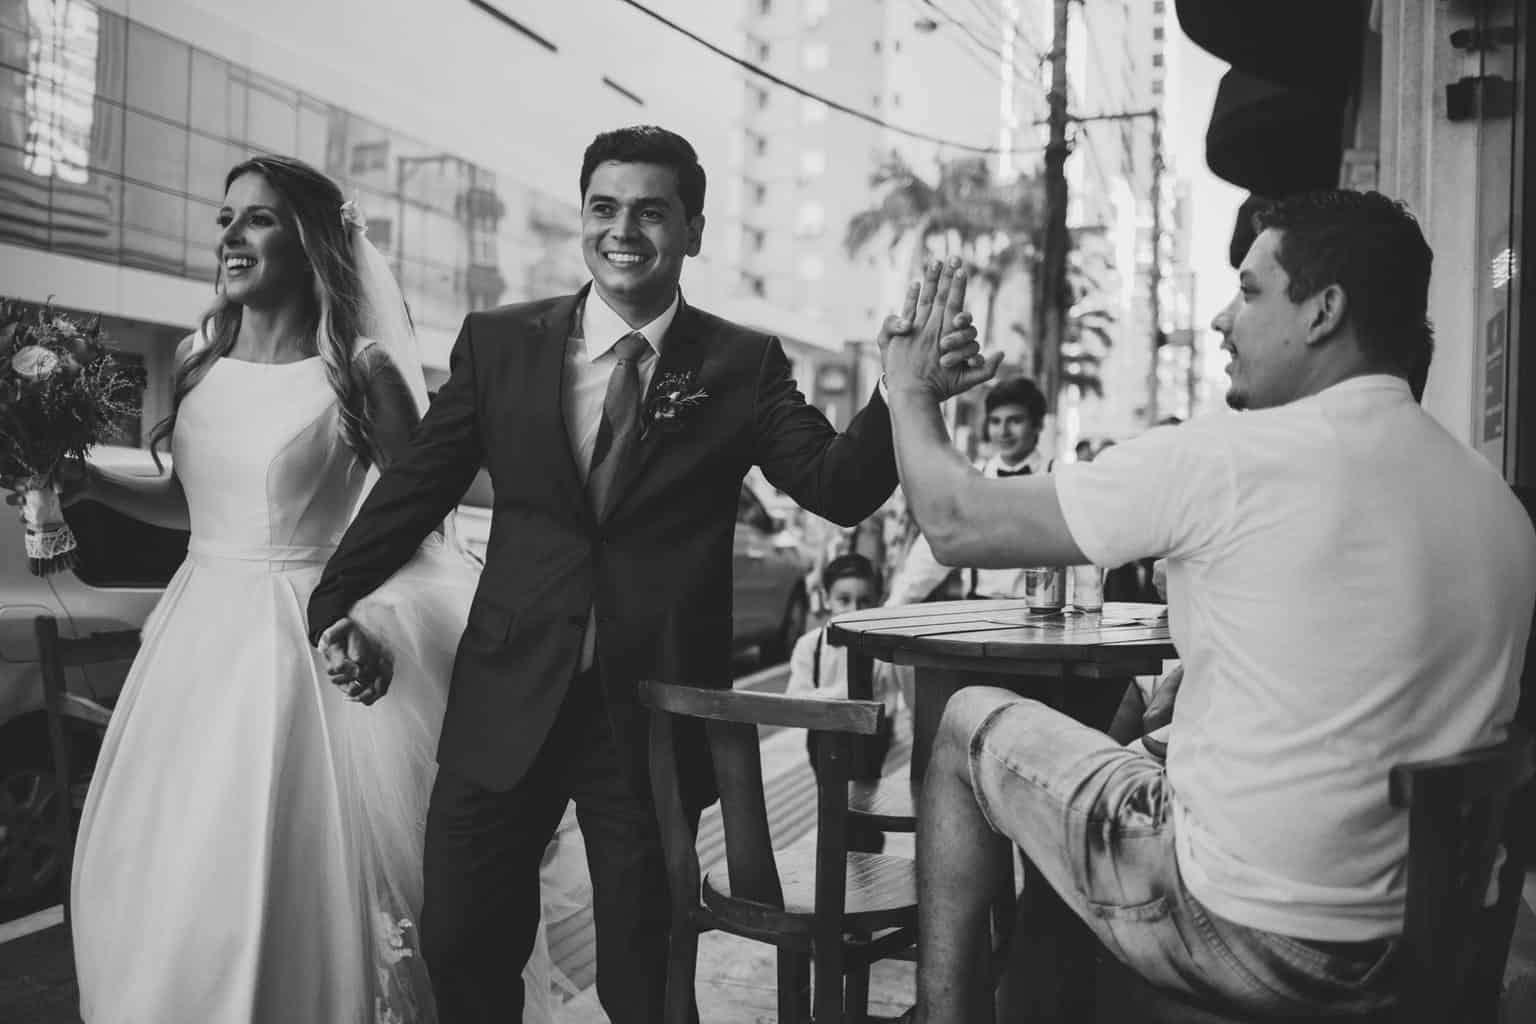 casamento-julia-e-guilherme-caseme-33